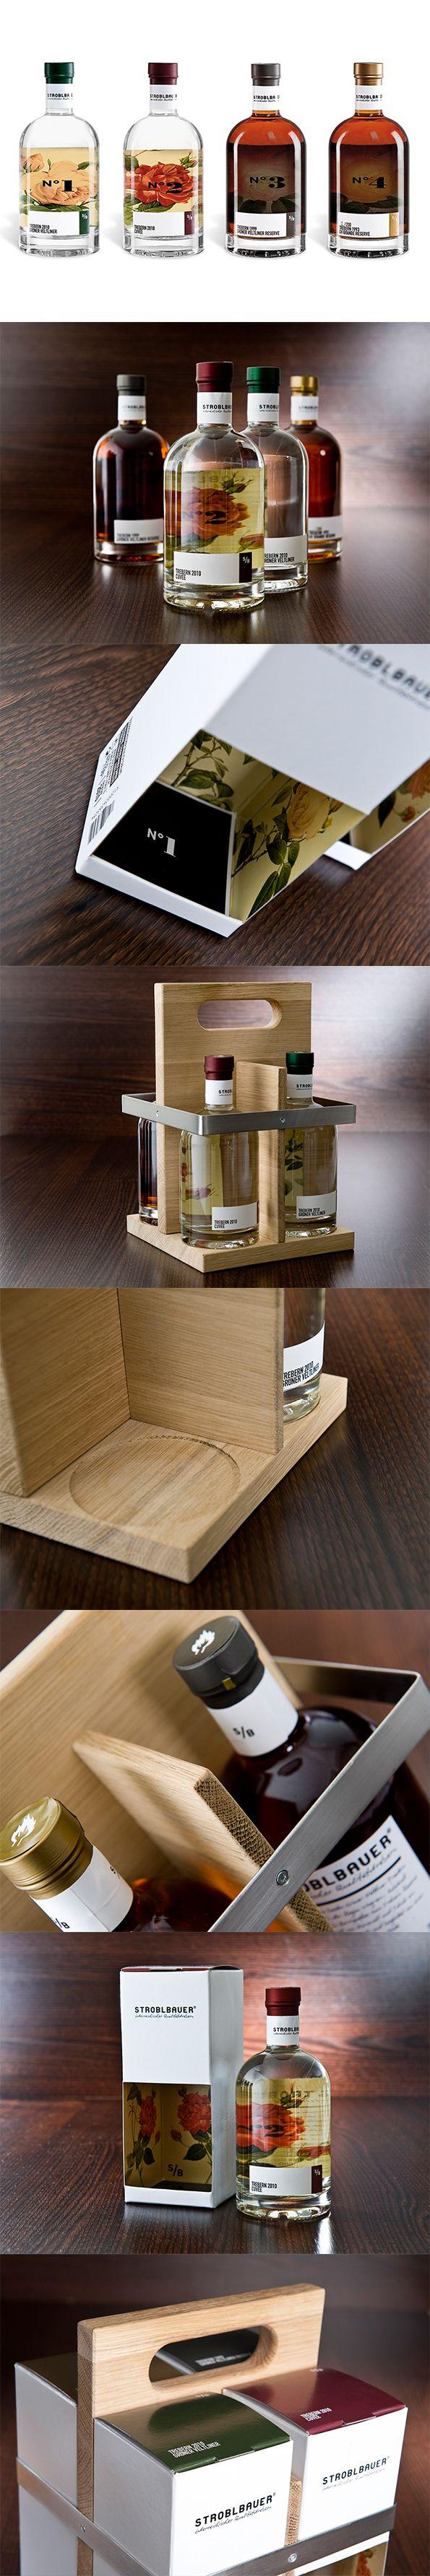 STROBLBAUER // Packaging: By www.strobl-kriegner.com #packaging #design #creative #packagingdesign #corporate #branding #marketing